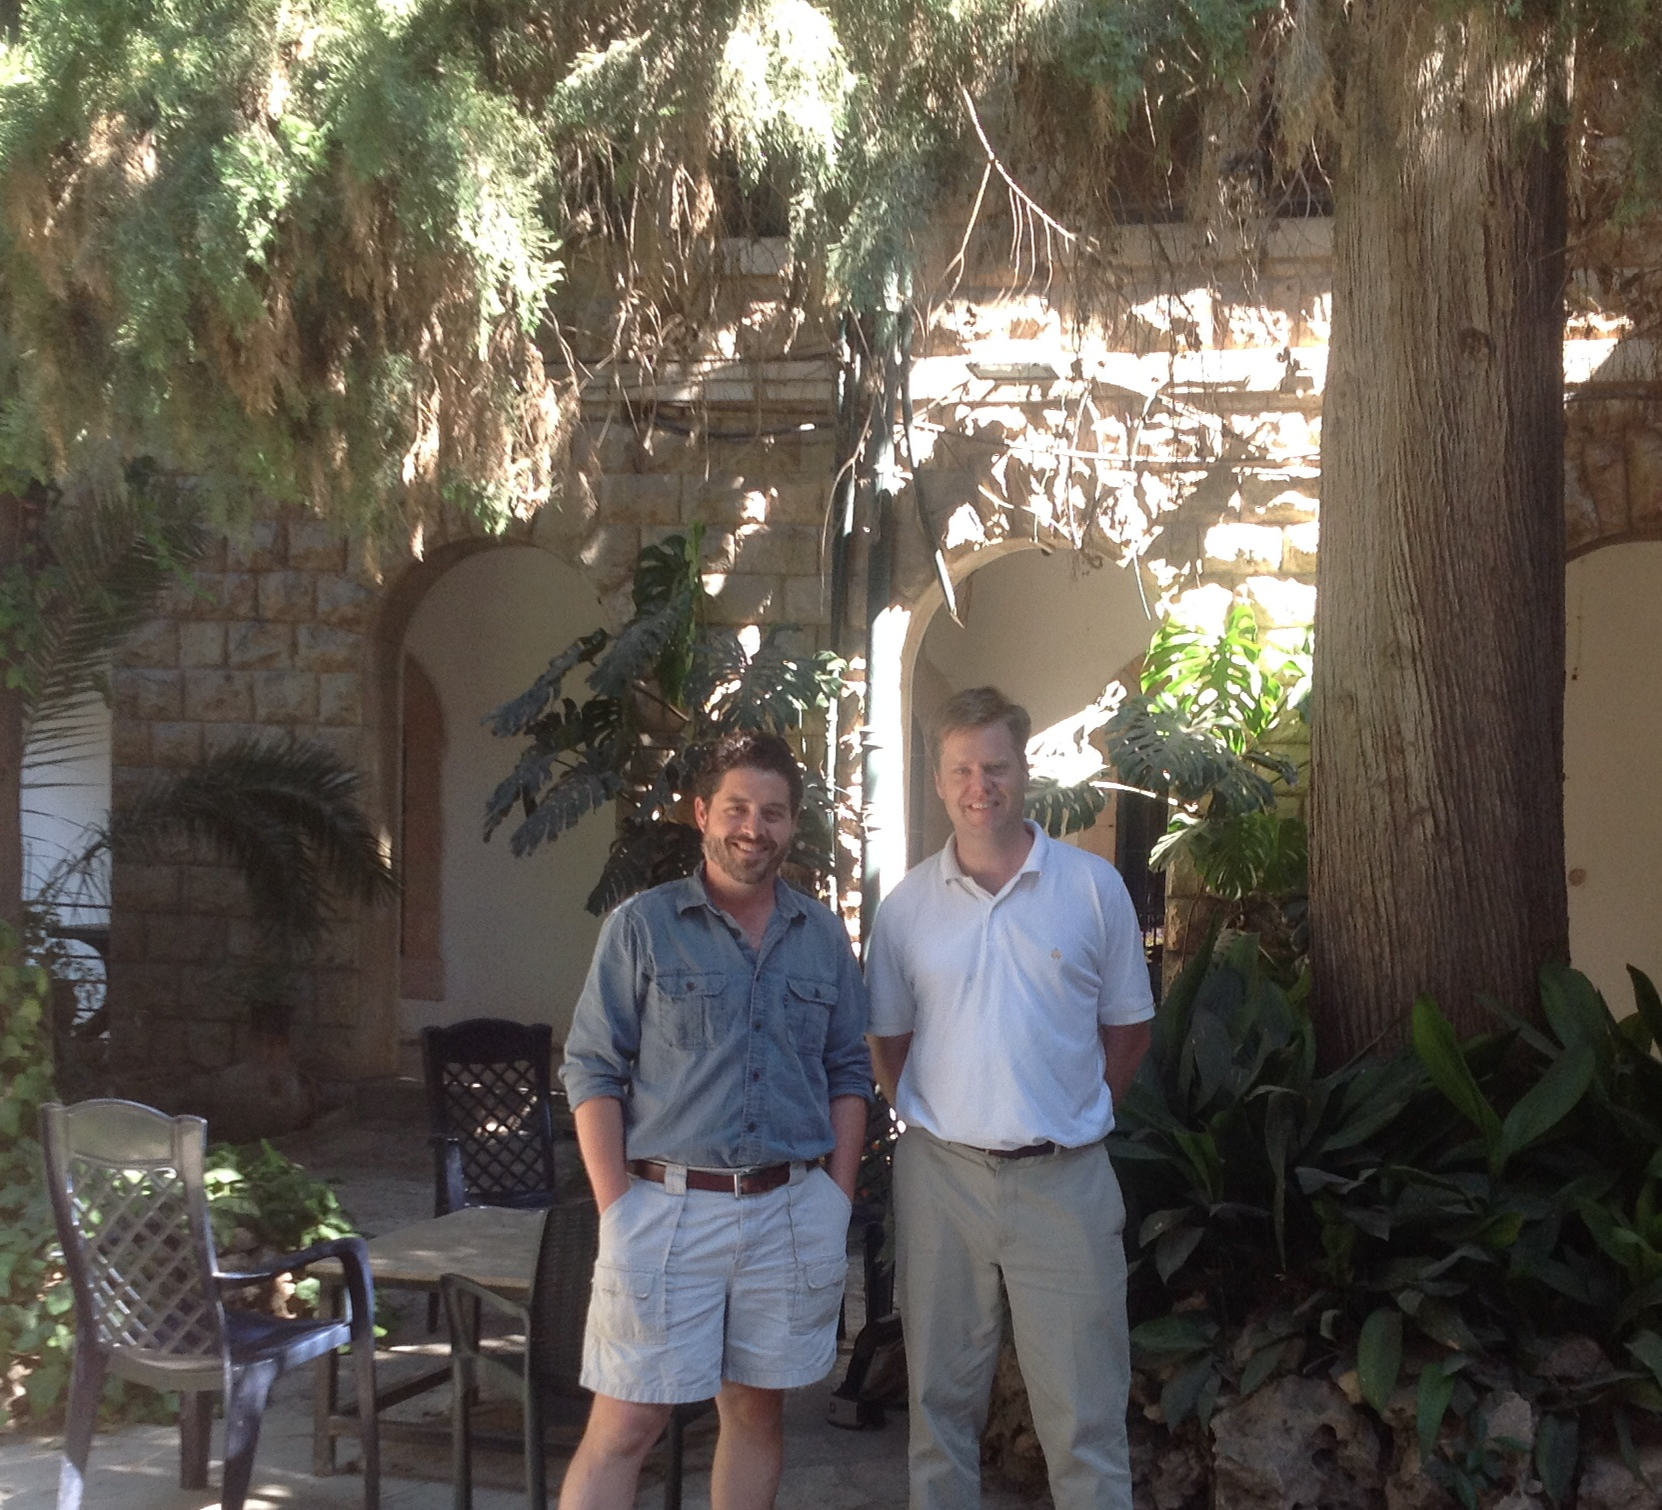 Daniel Master and Matt Adams in the Albright courtyard